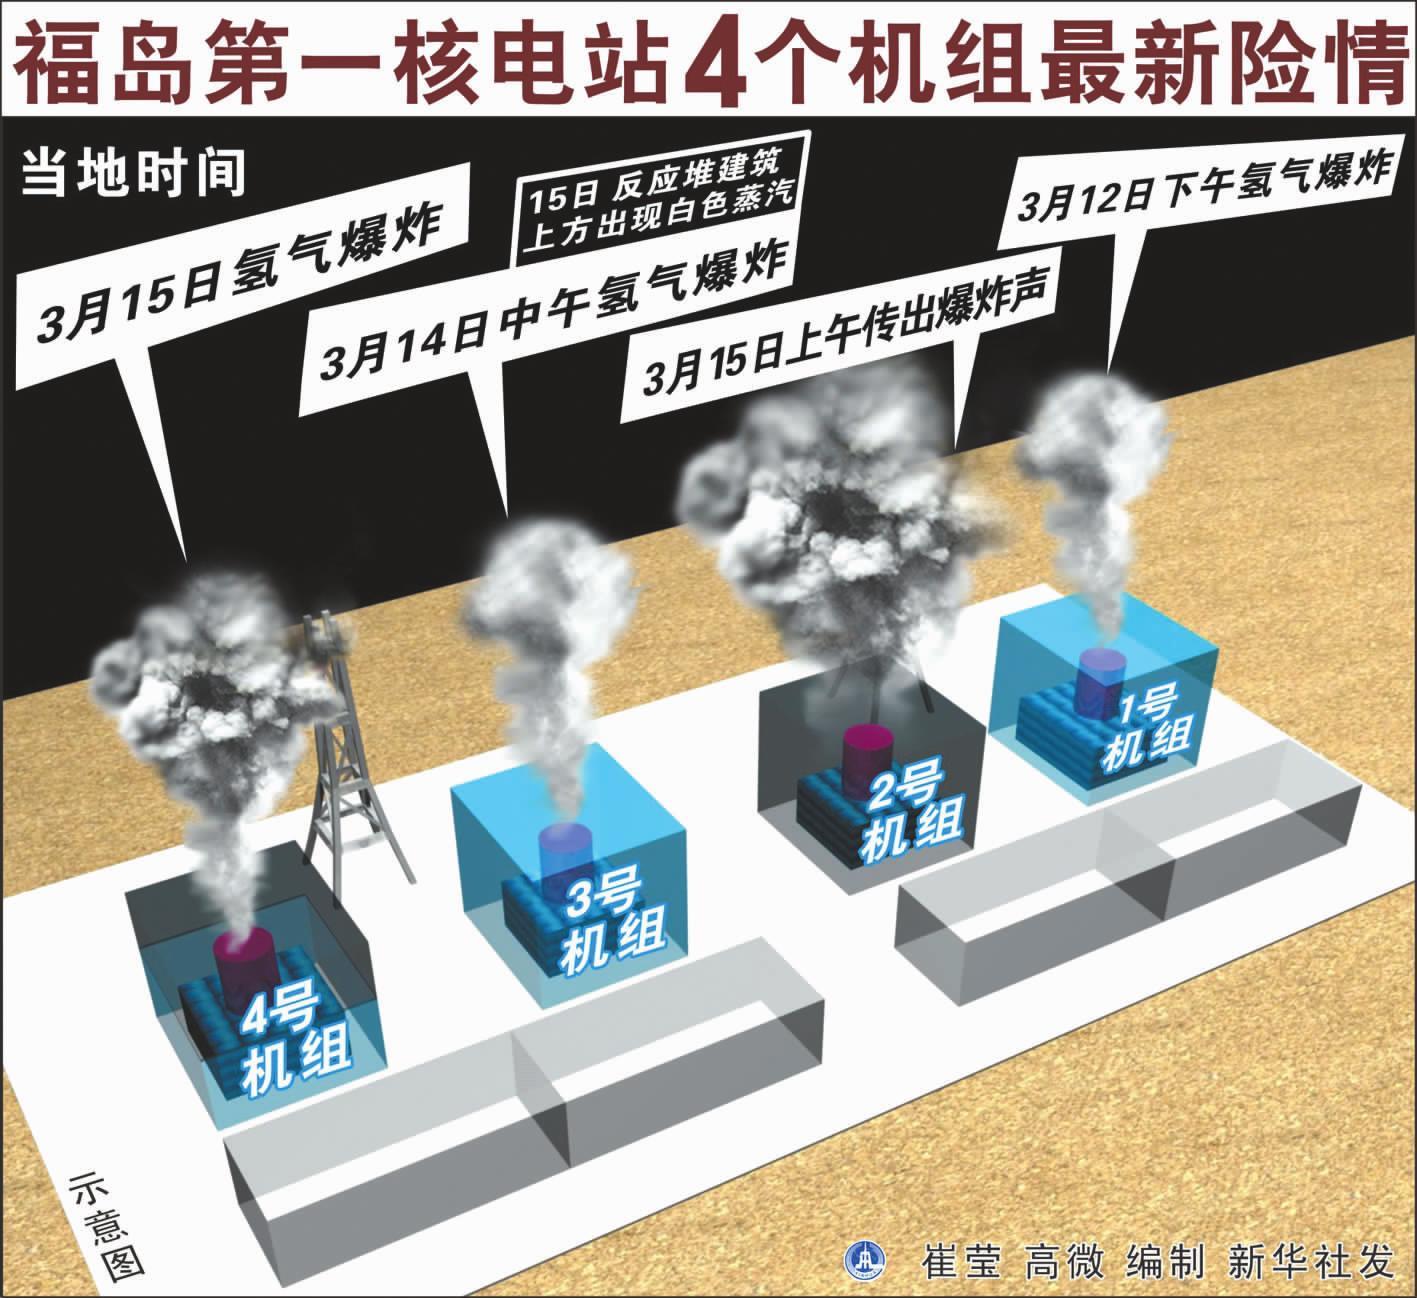 The fourth explosion heard at Fukushima Nuclear Power Station